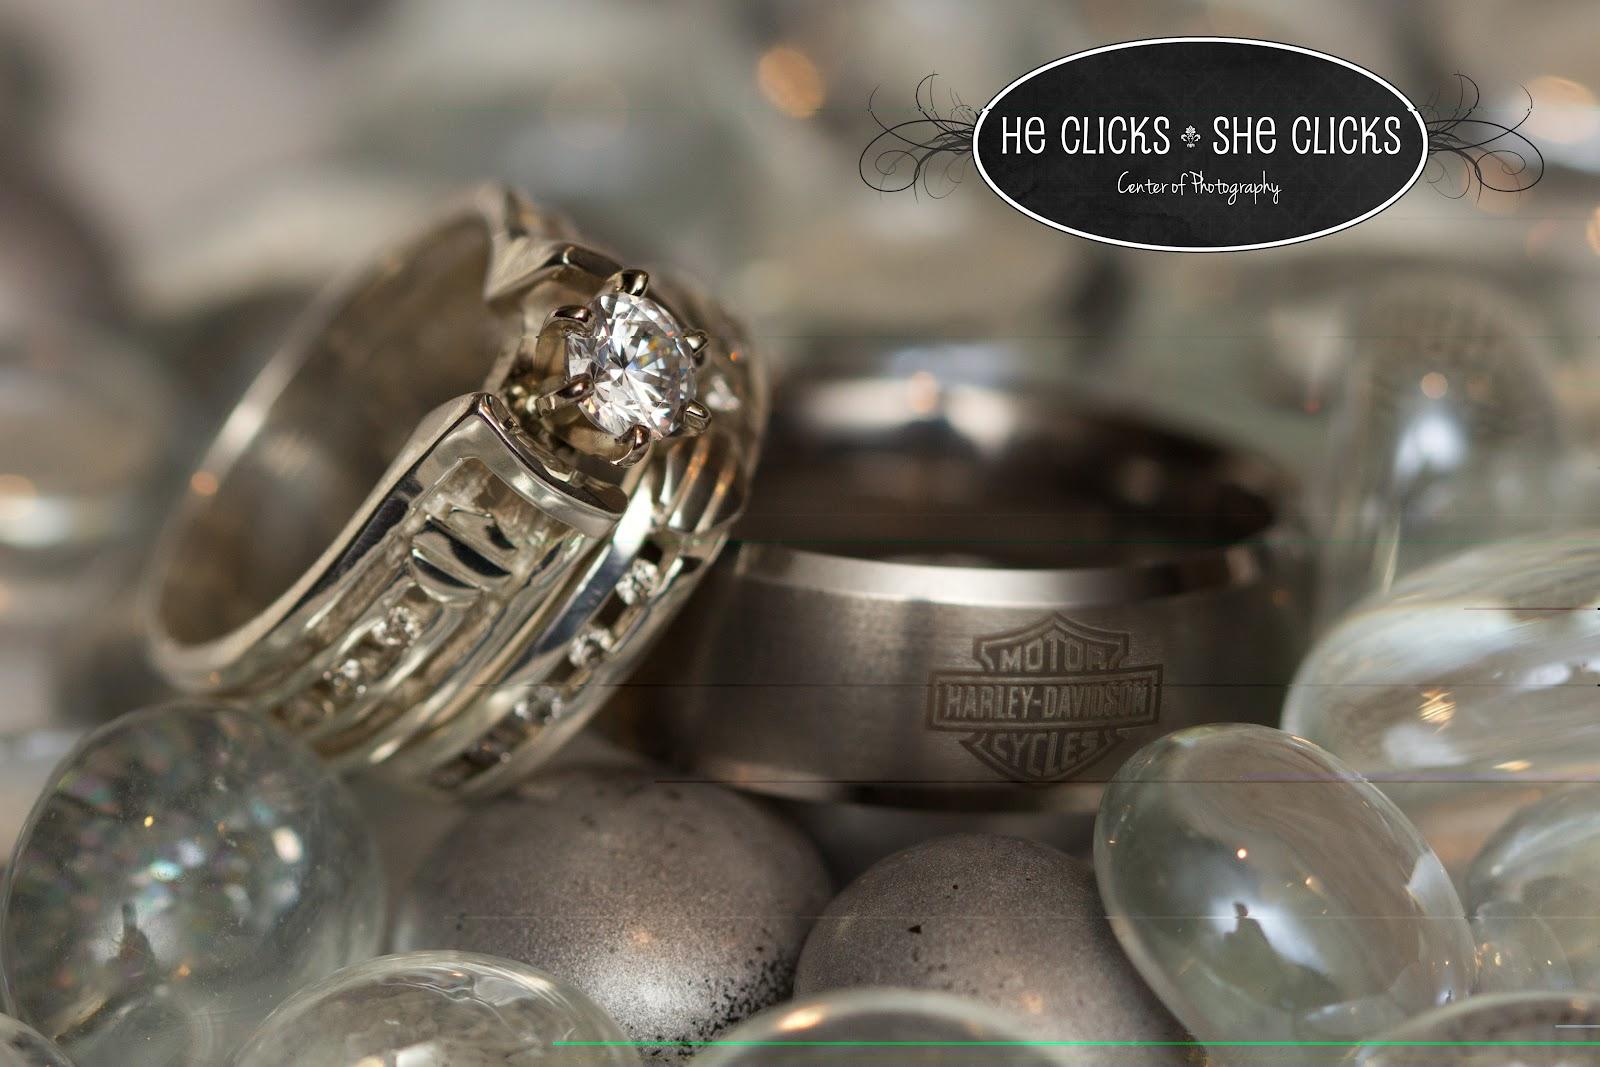 Harley Davidson Wedding: He Clicks-She Clicks Center Of Photography: John And